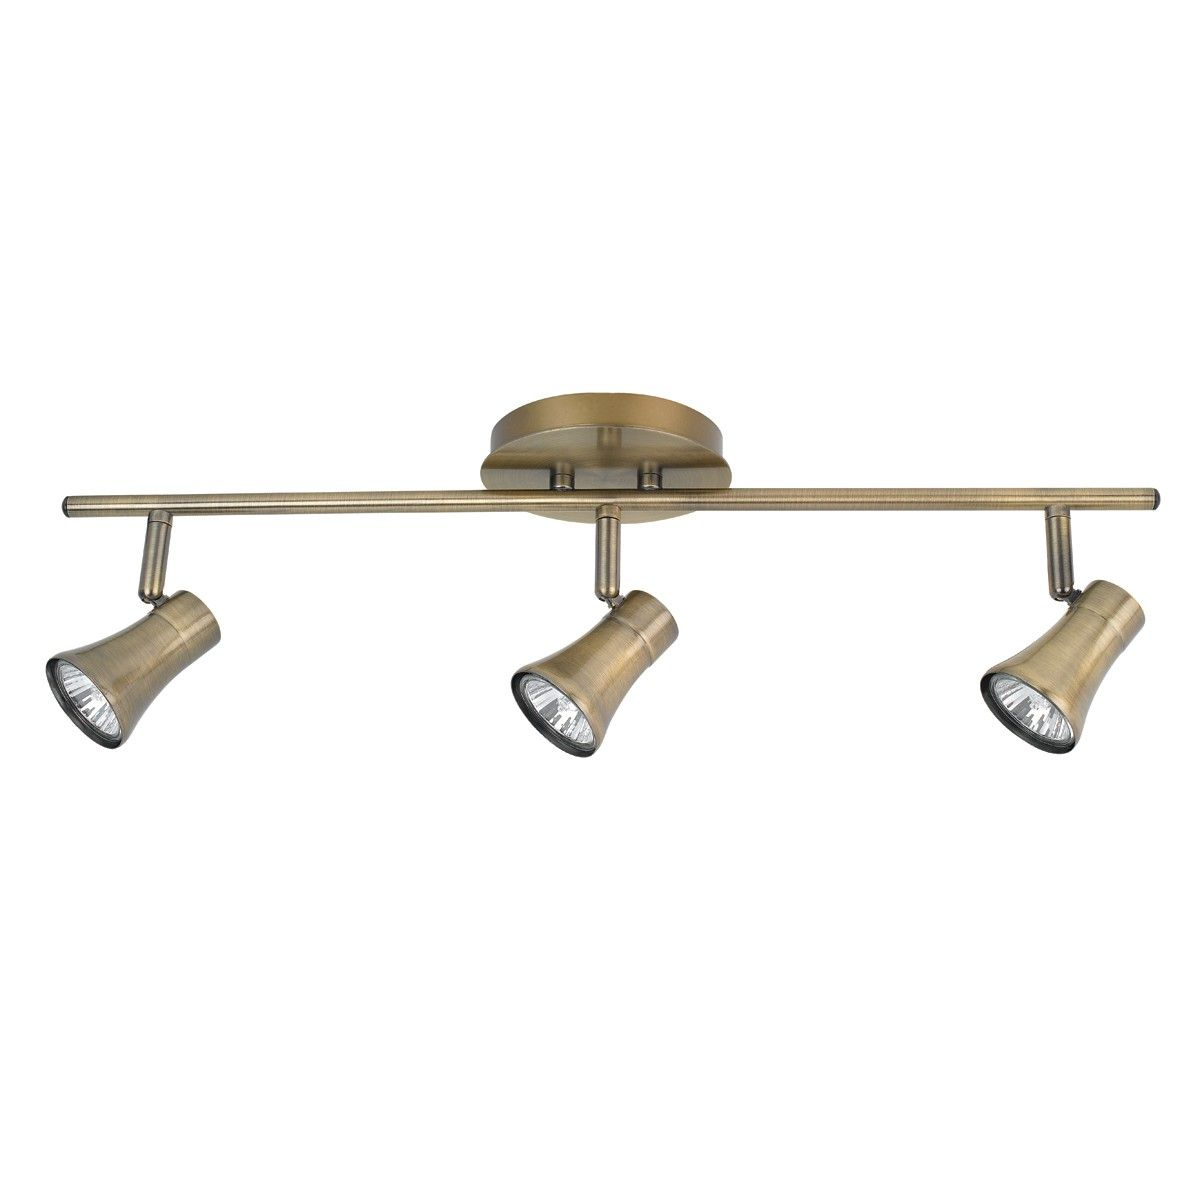 3 light track lighting kit antique brass finish 4498 lighting 3 light track lighting kit antique brass finish 4498 mozeypictures Gallery